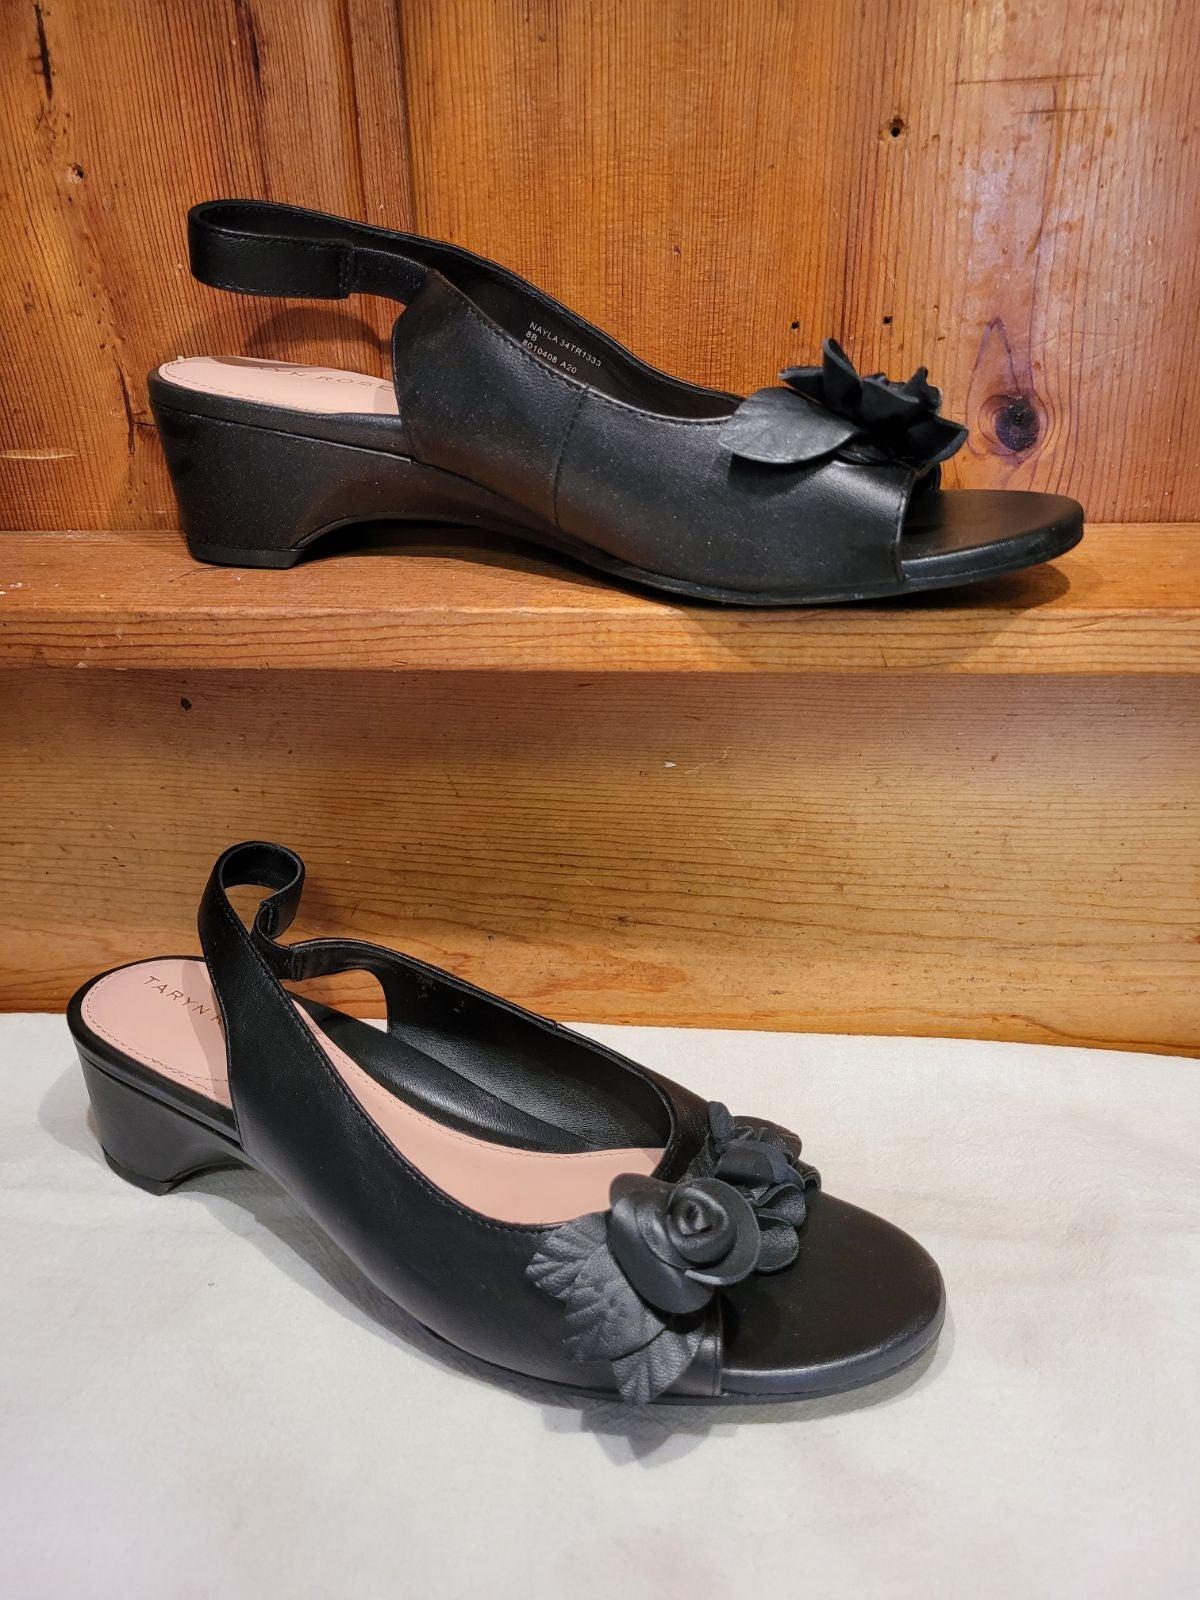 Taryn Rose black leather slingbacks Sz 8